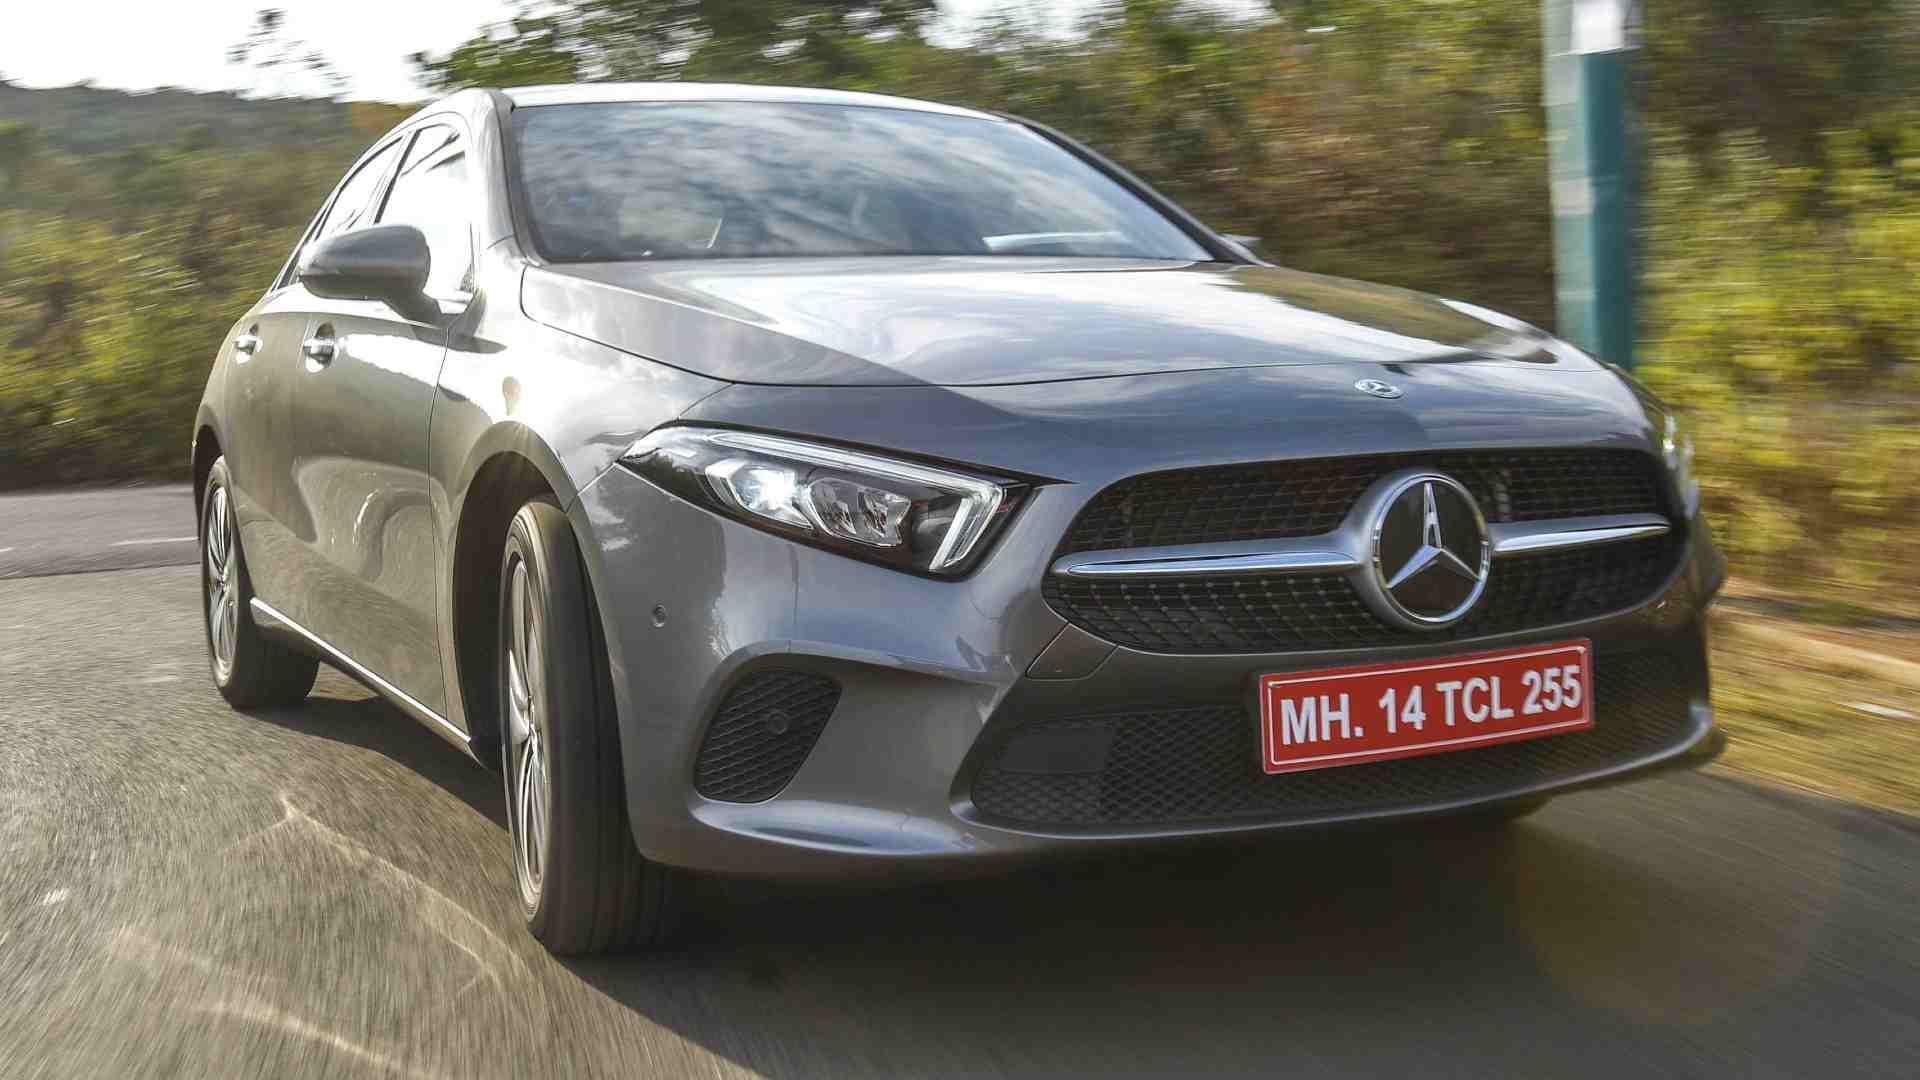 Mercedes-Benz A-Class Limousine India review- Technology News, FP